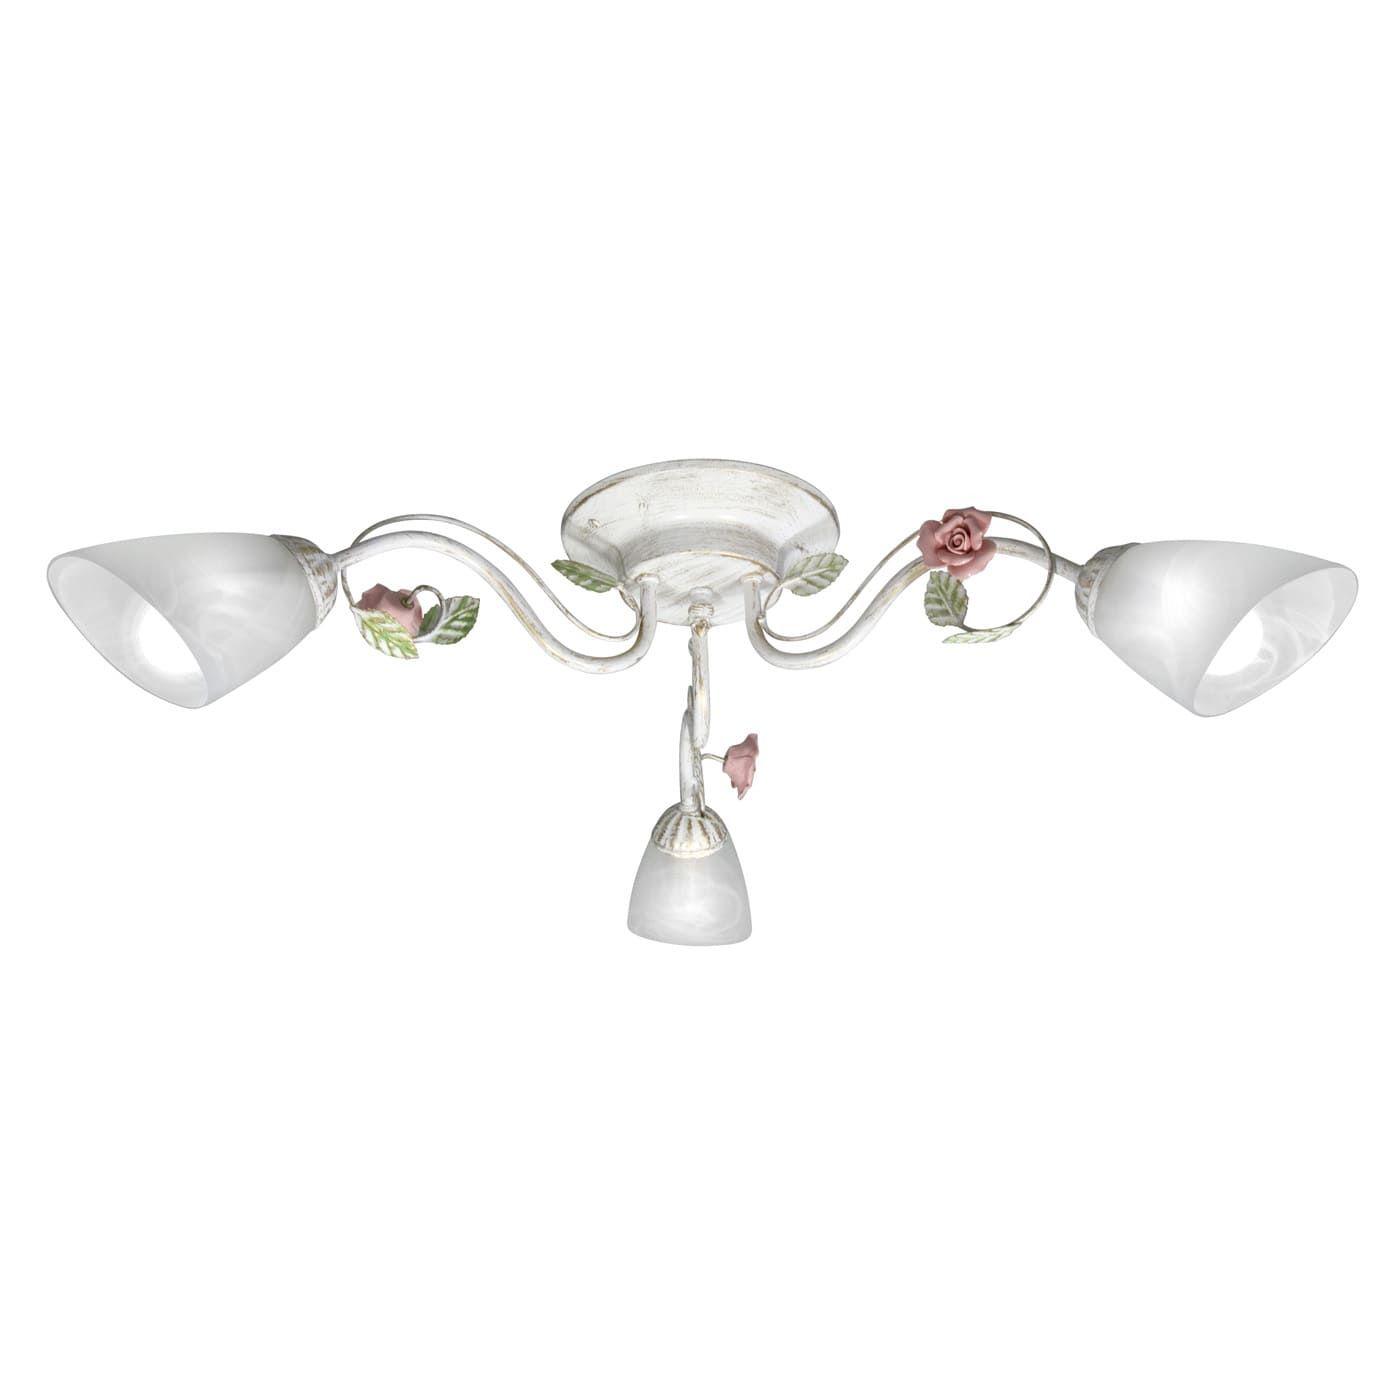 PETRASVET / Ceiling chandelier S2112-3, 3xE14 max. 60W